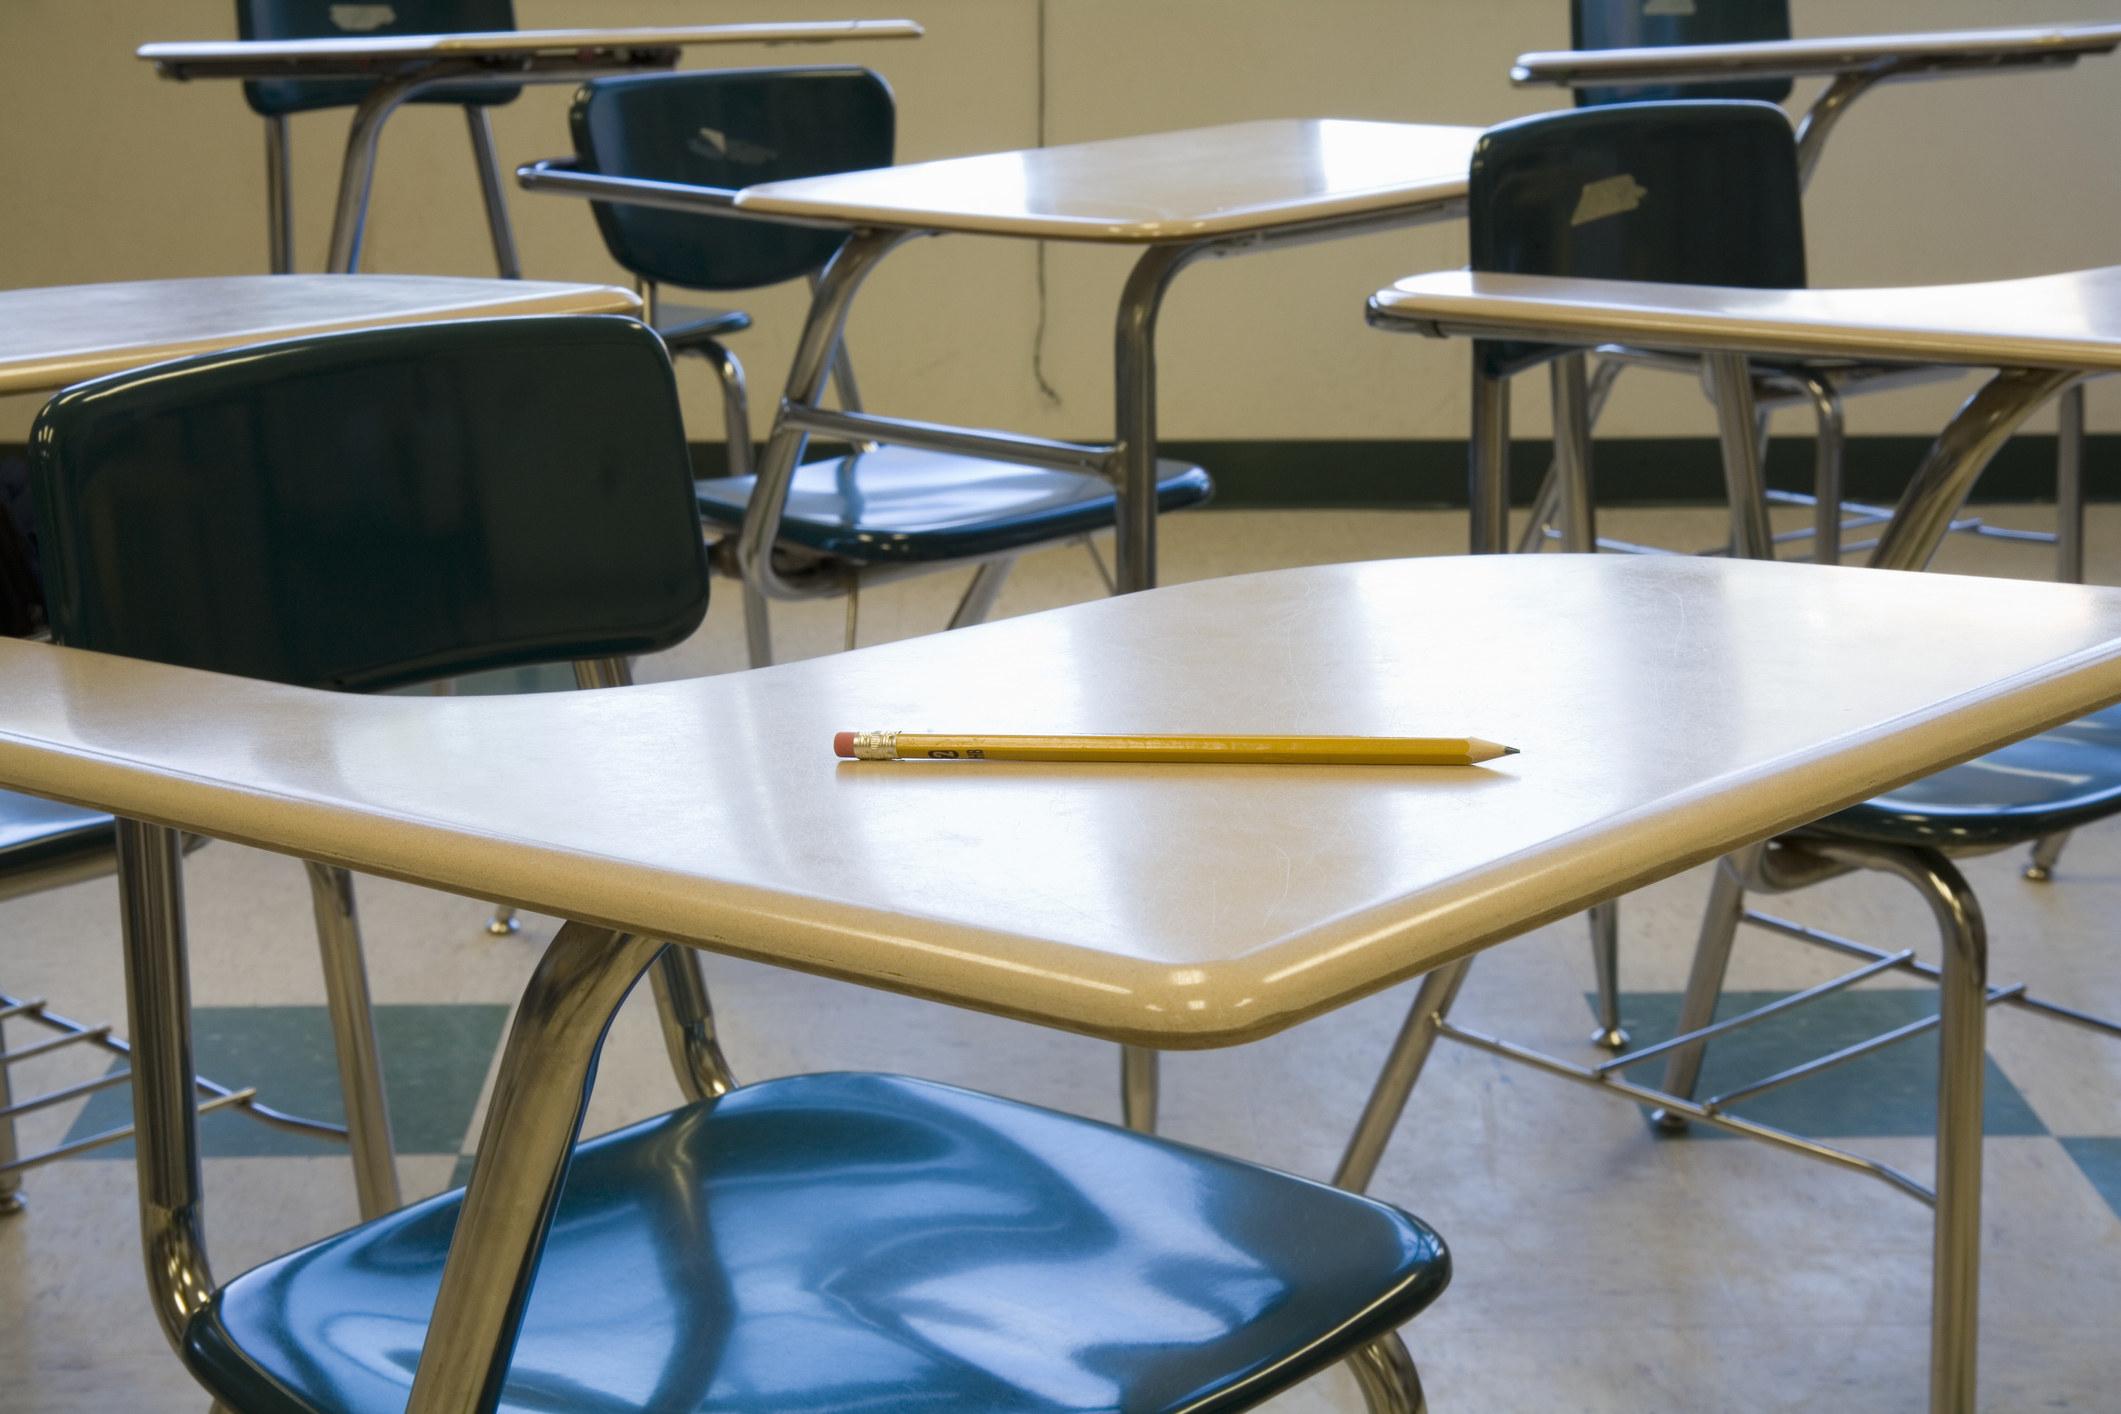 A pencil laying on a school desk